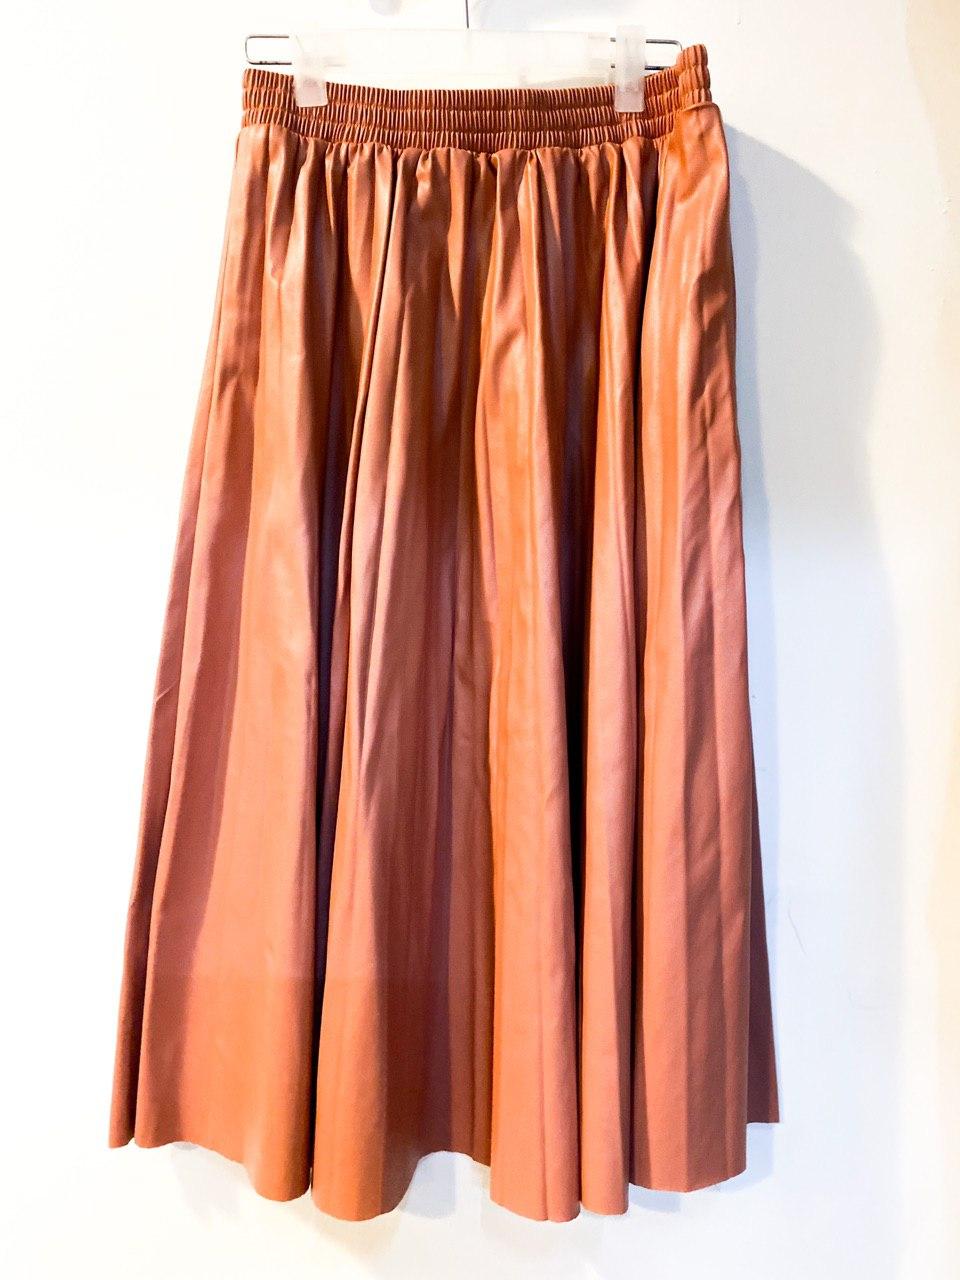 Women High-Waist Pleated Pu Leather Skirts Casual